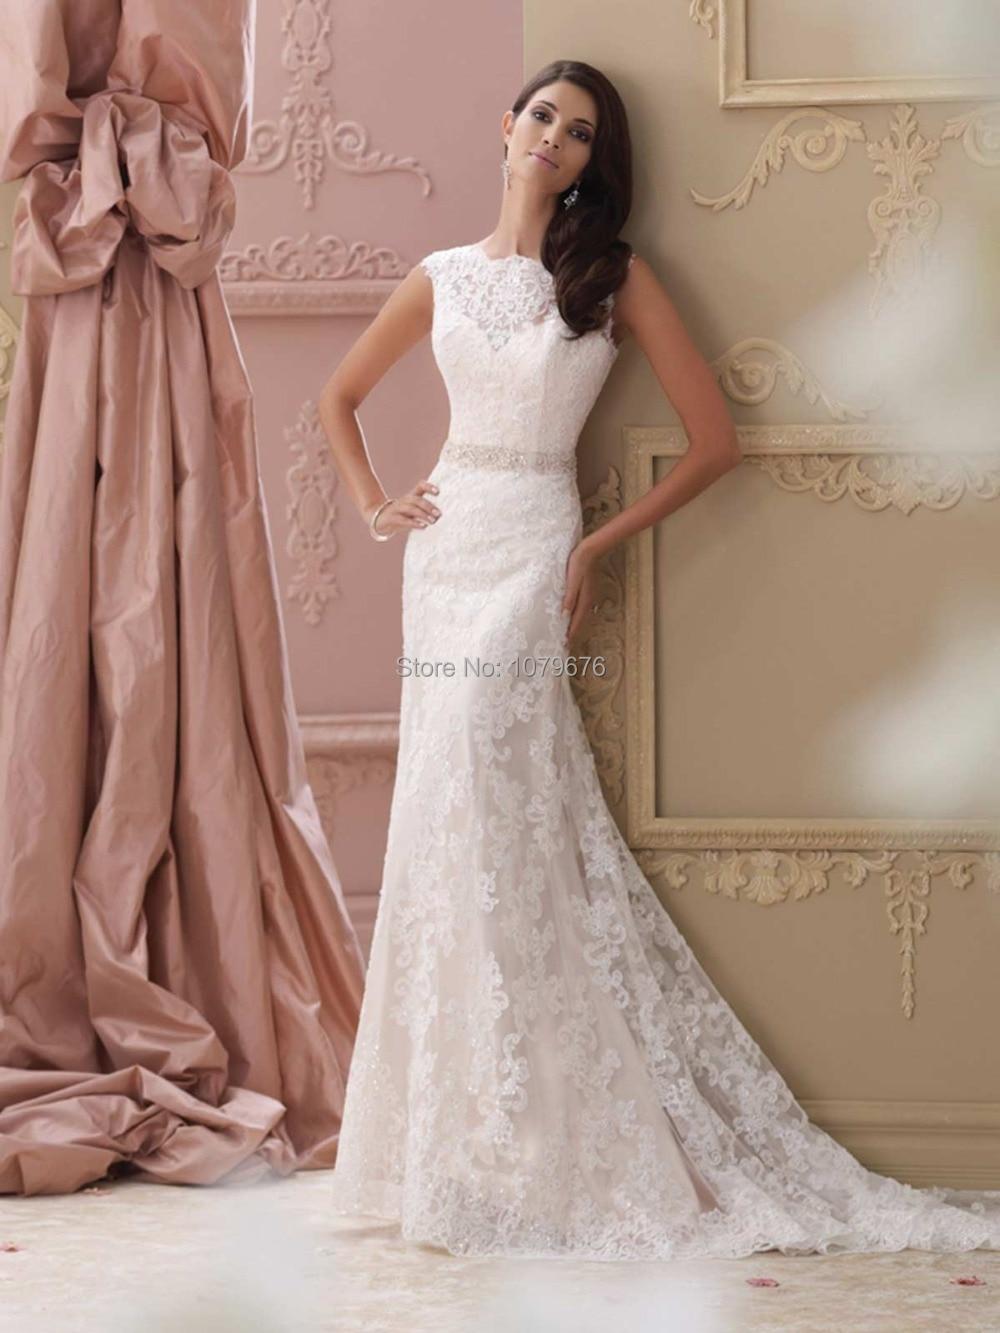 find elegant simple wedding dress elegant wedding dresses Find Elegant Simple Wedding Dress